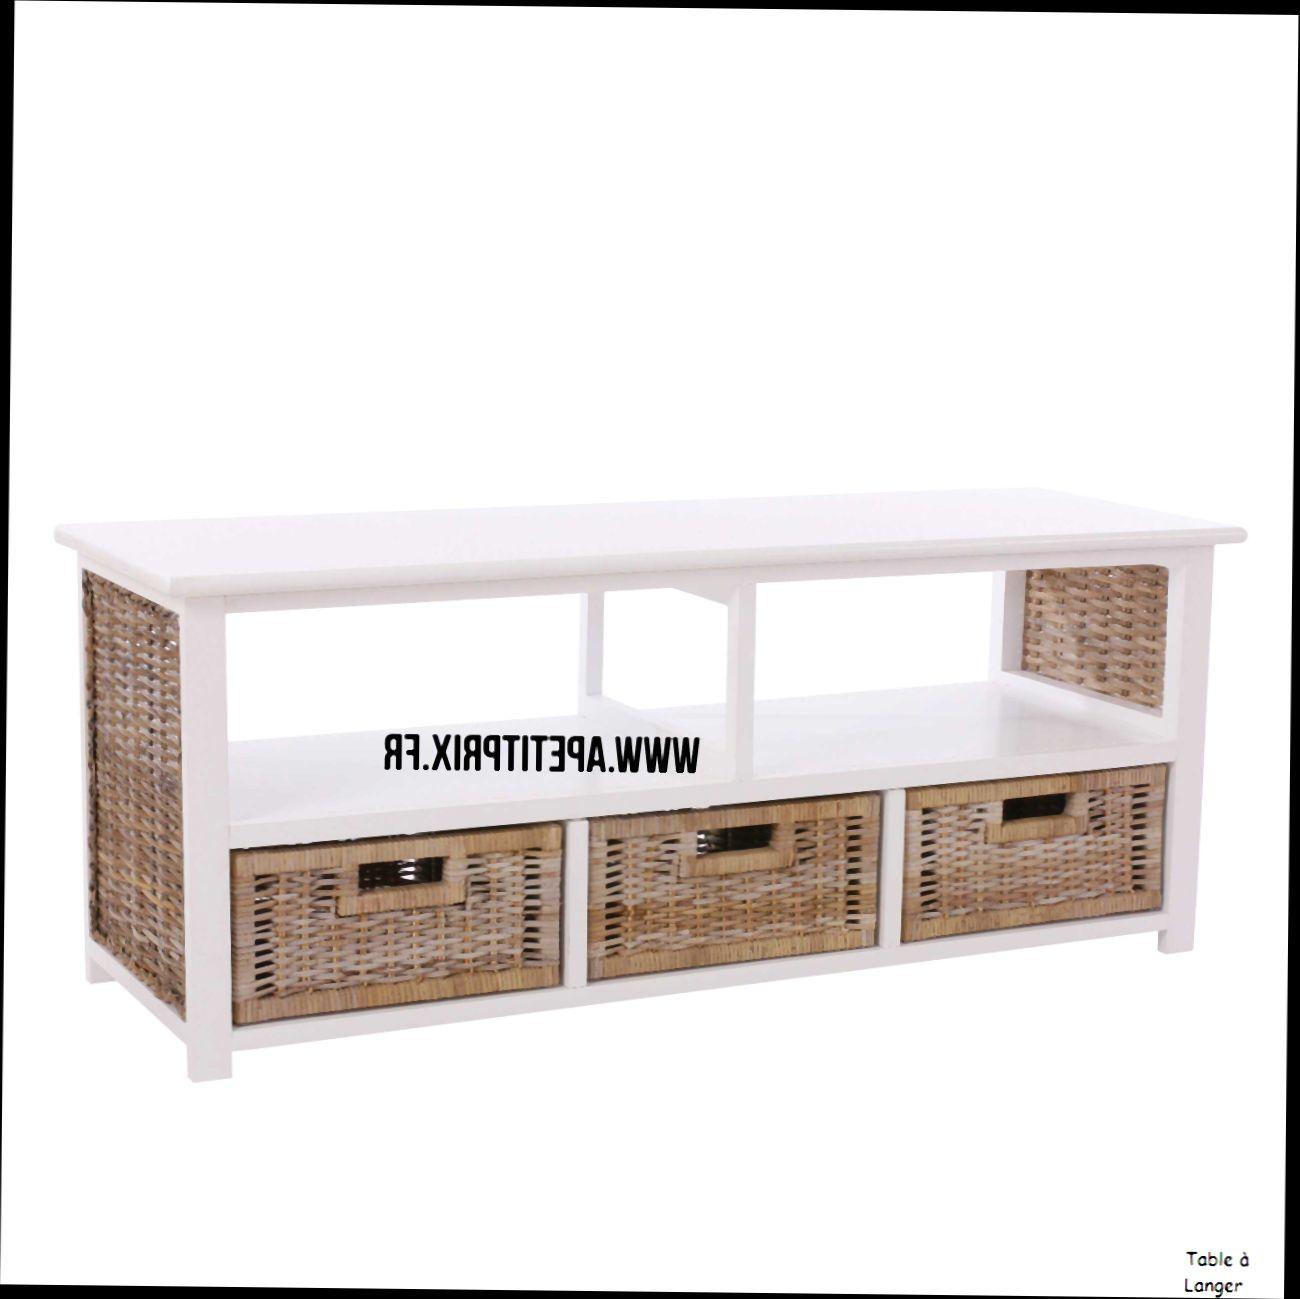 Relooker une table basse en verre mobilier design - Relooker table basse ...